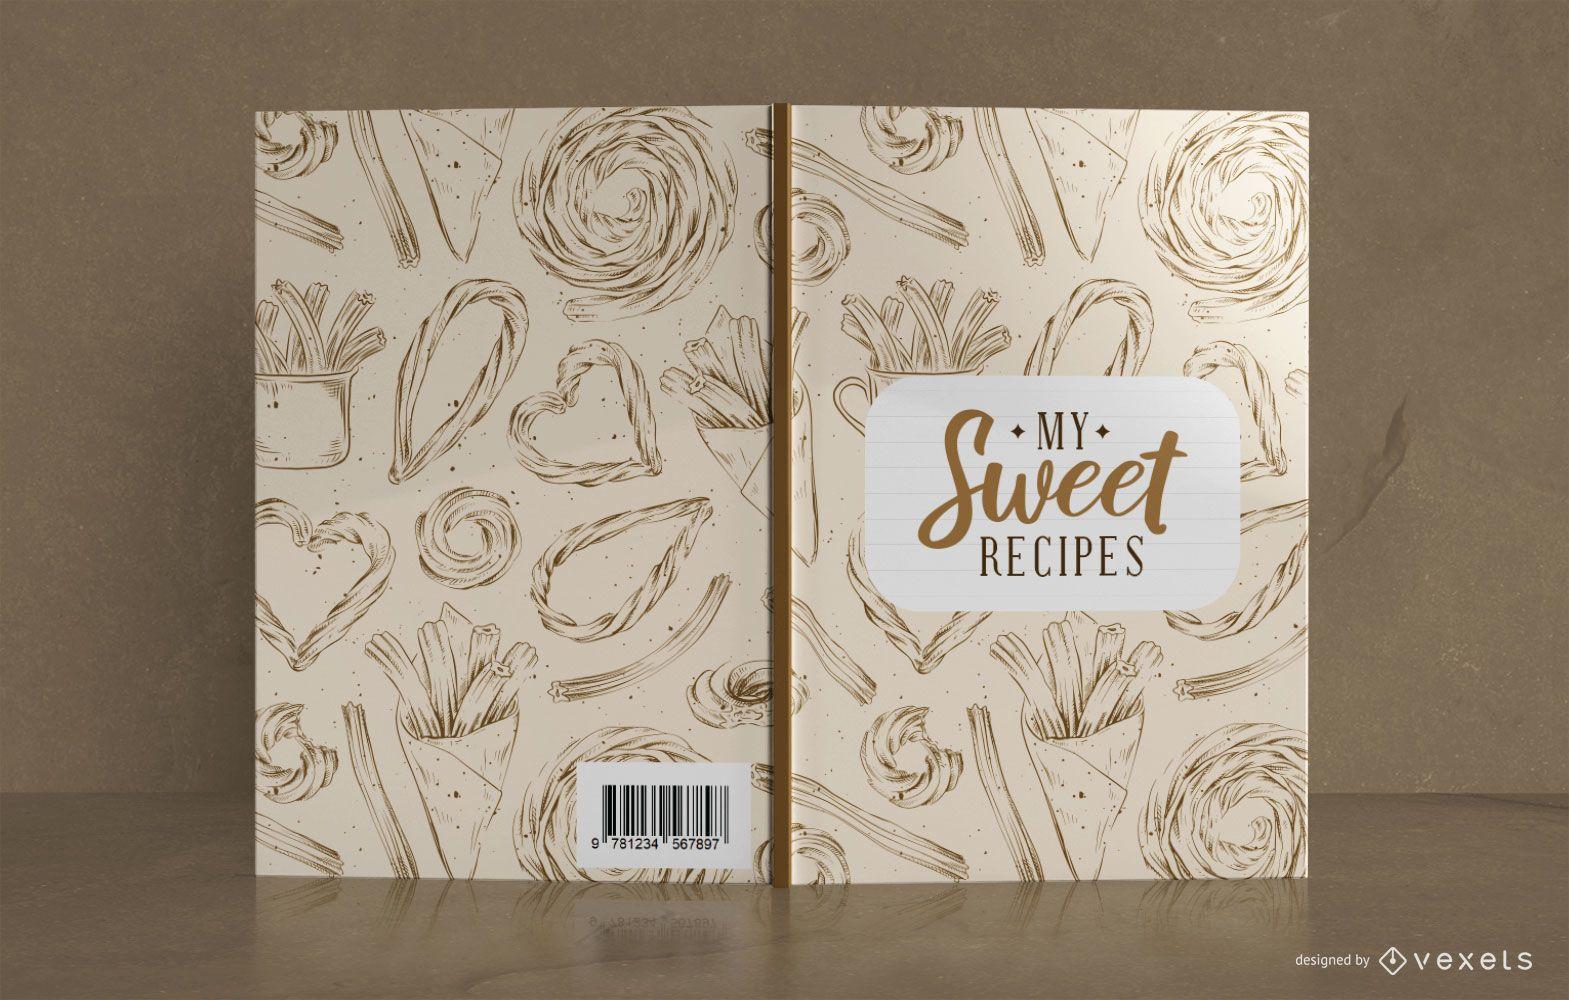 Diseño de portada de libro de recetas dulces